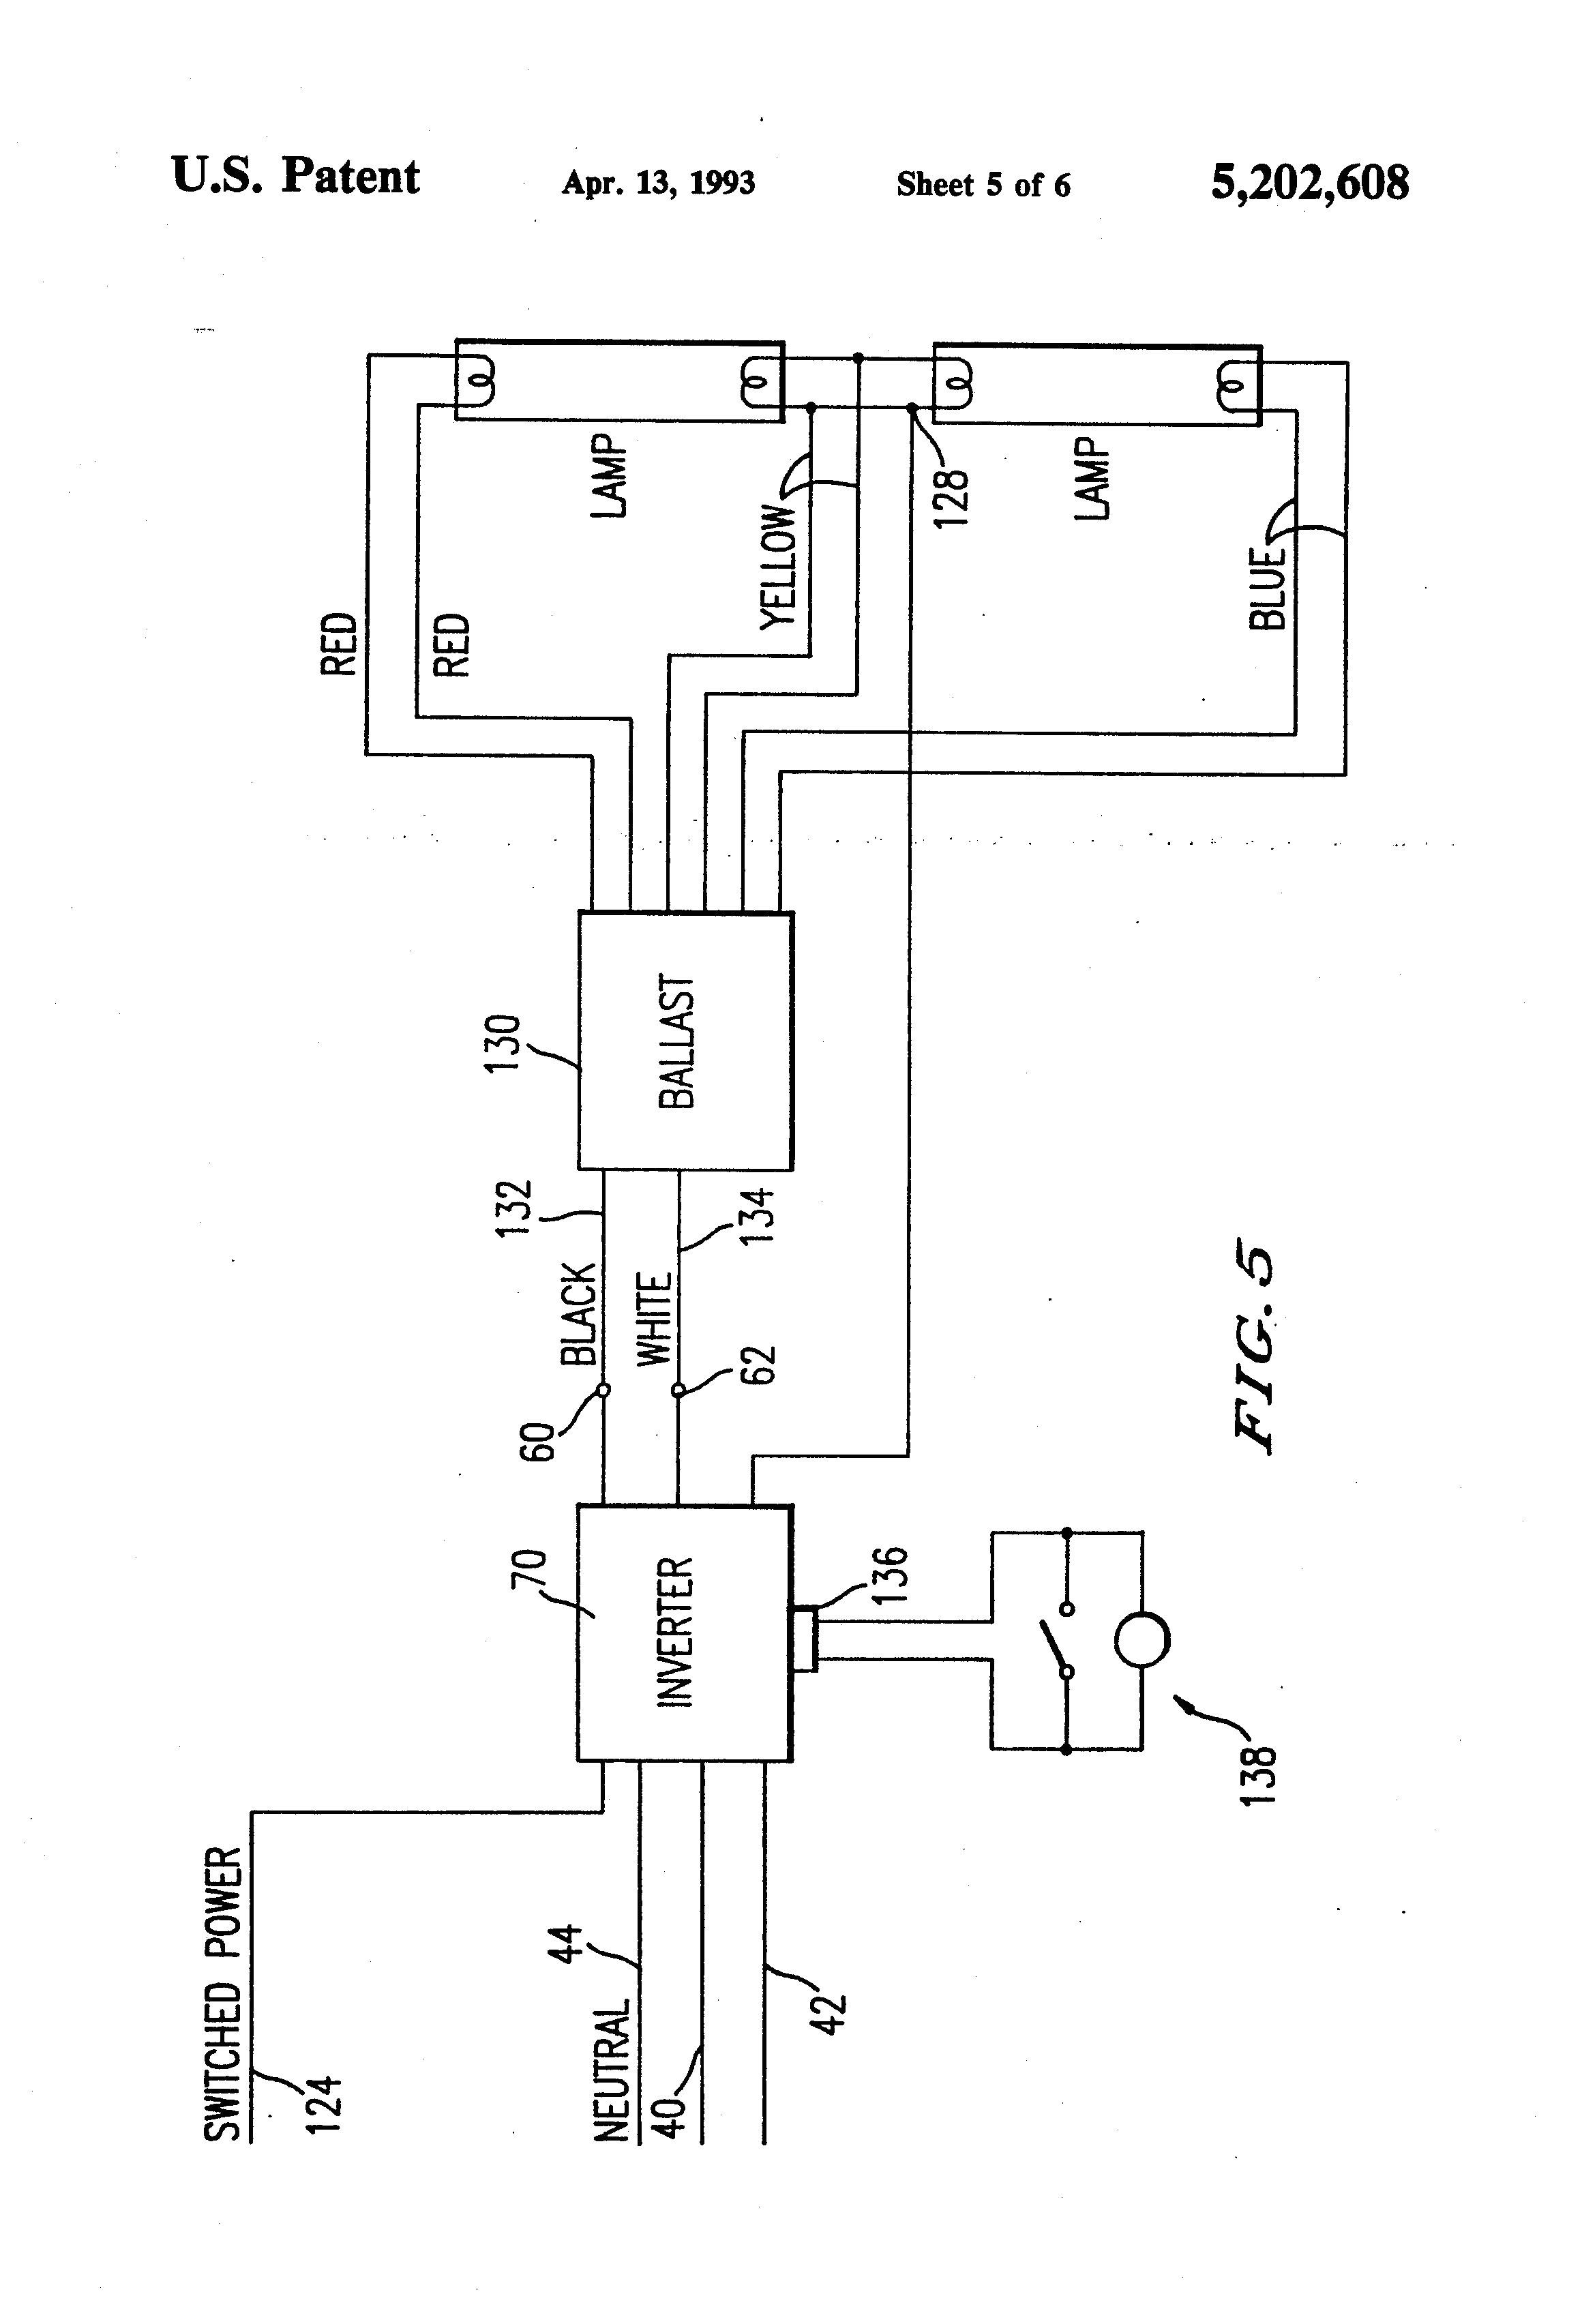 icf 2s26 h1 ld wiring diagram inspirational philips advance ballast wiring diagram citruscyclecenter